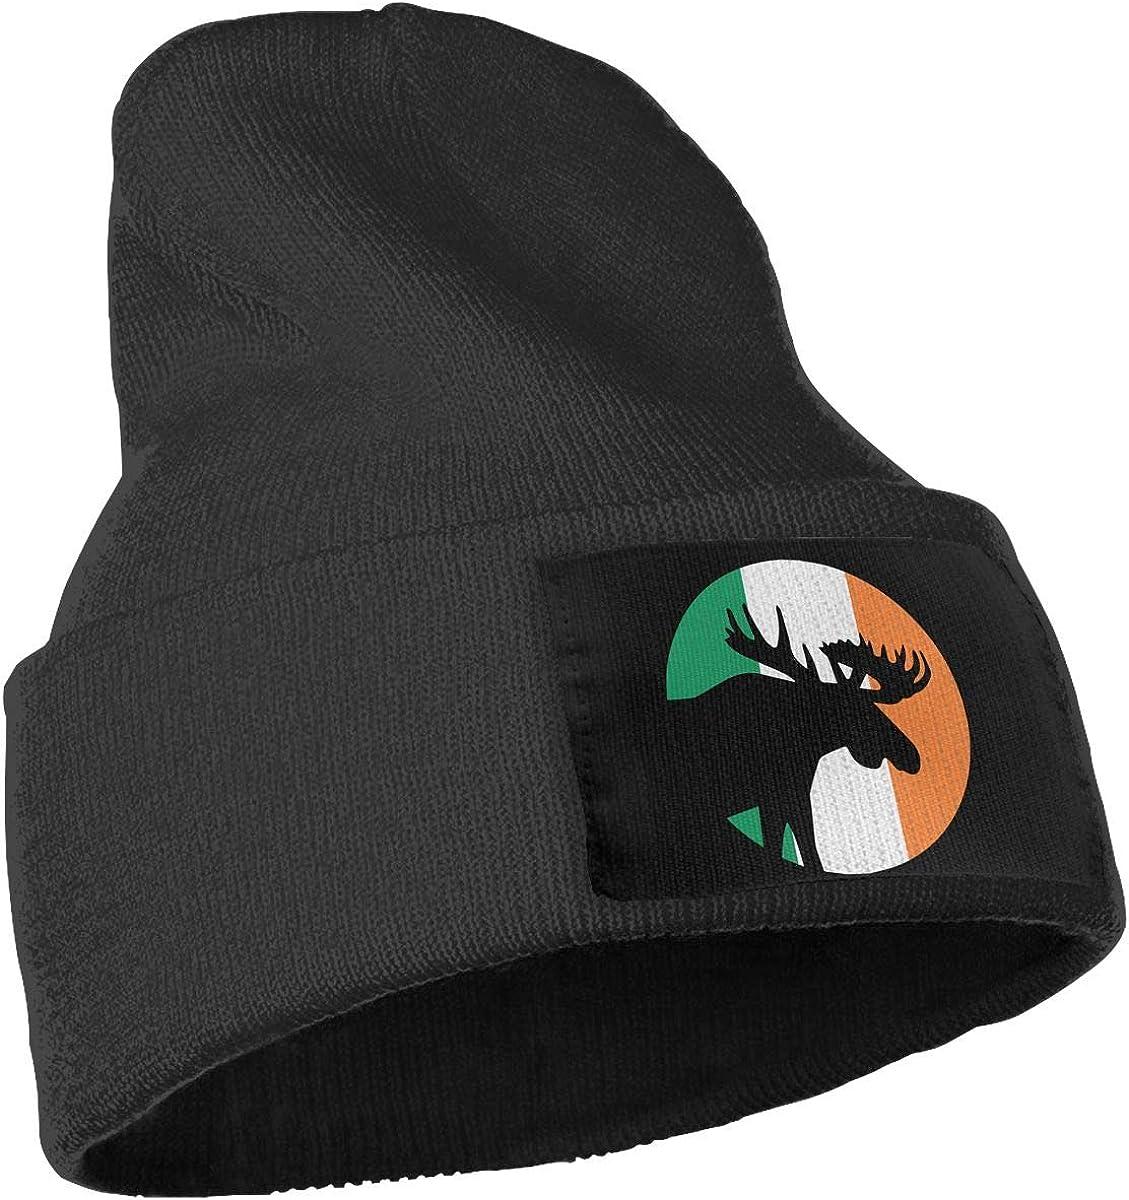 Irish Flag Moose Moon Skull Cap Men /& Women Knit Hats Stretchy /& Soft Beanie